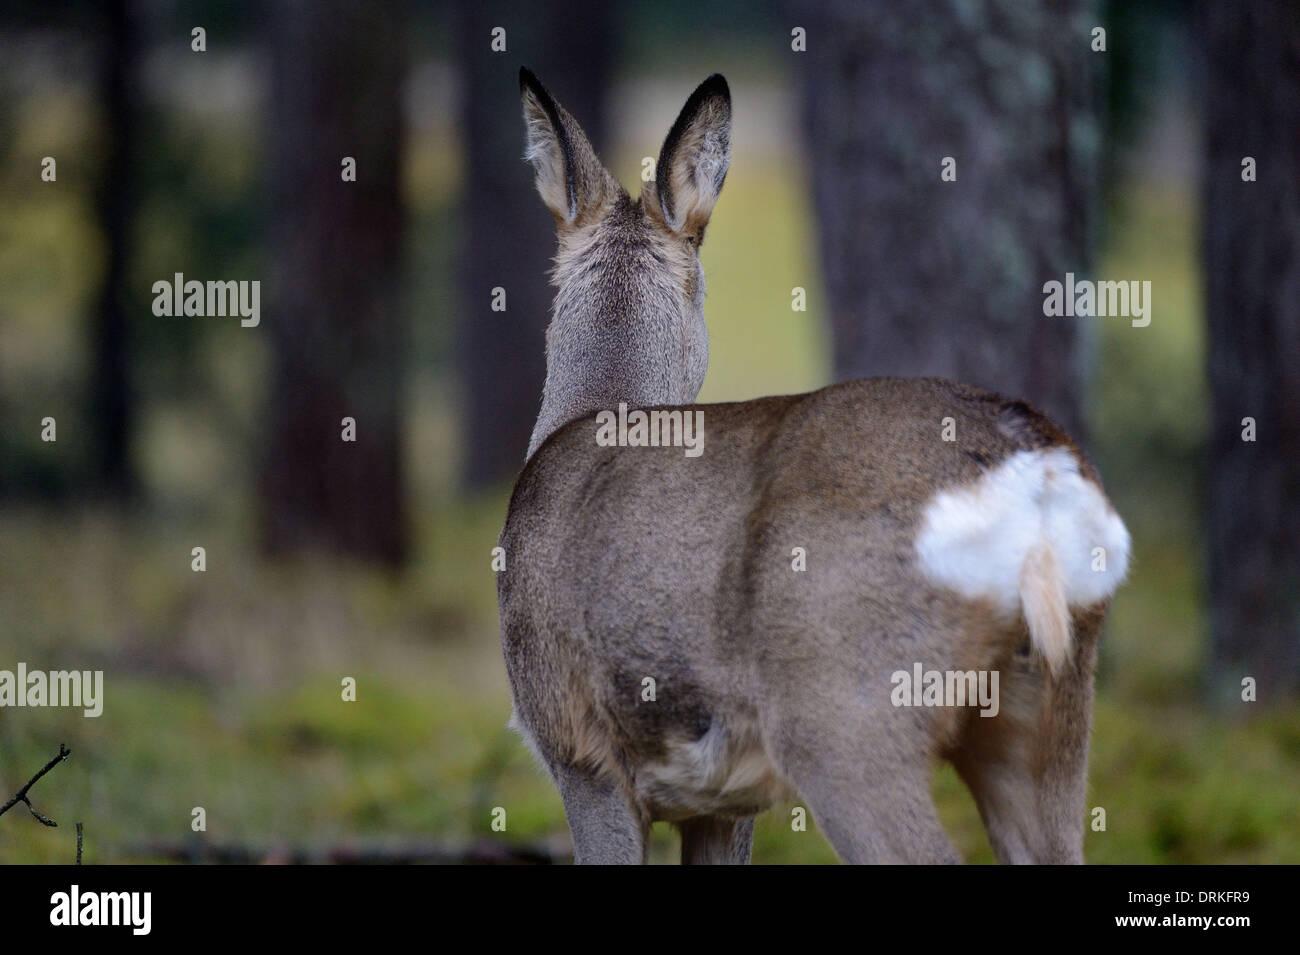 Roe deer in wintertime - 24 January 2014. Stock Photo